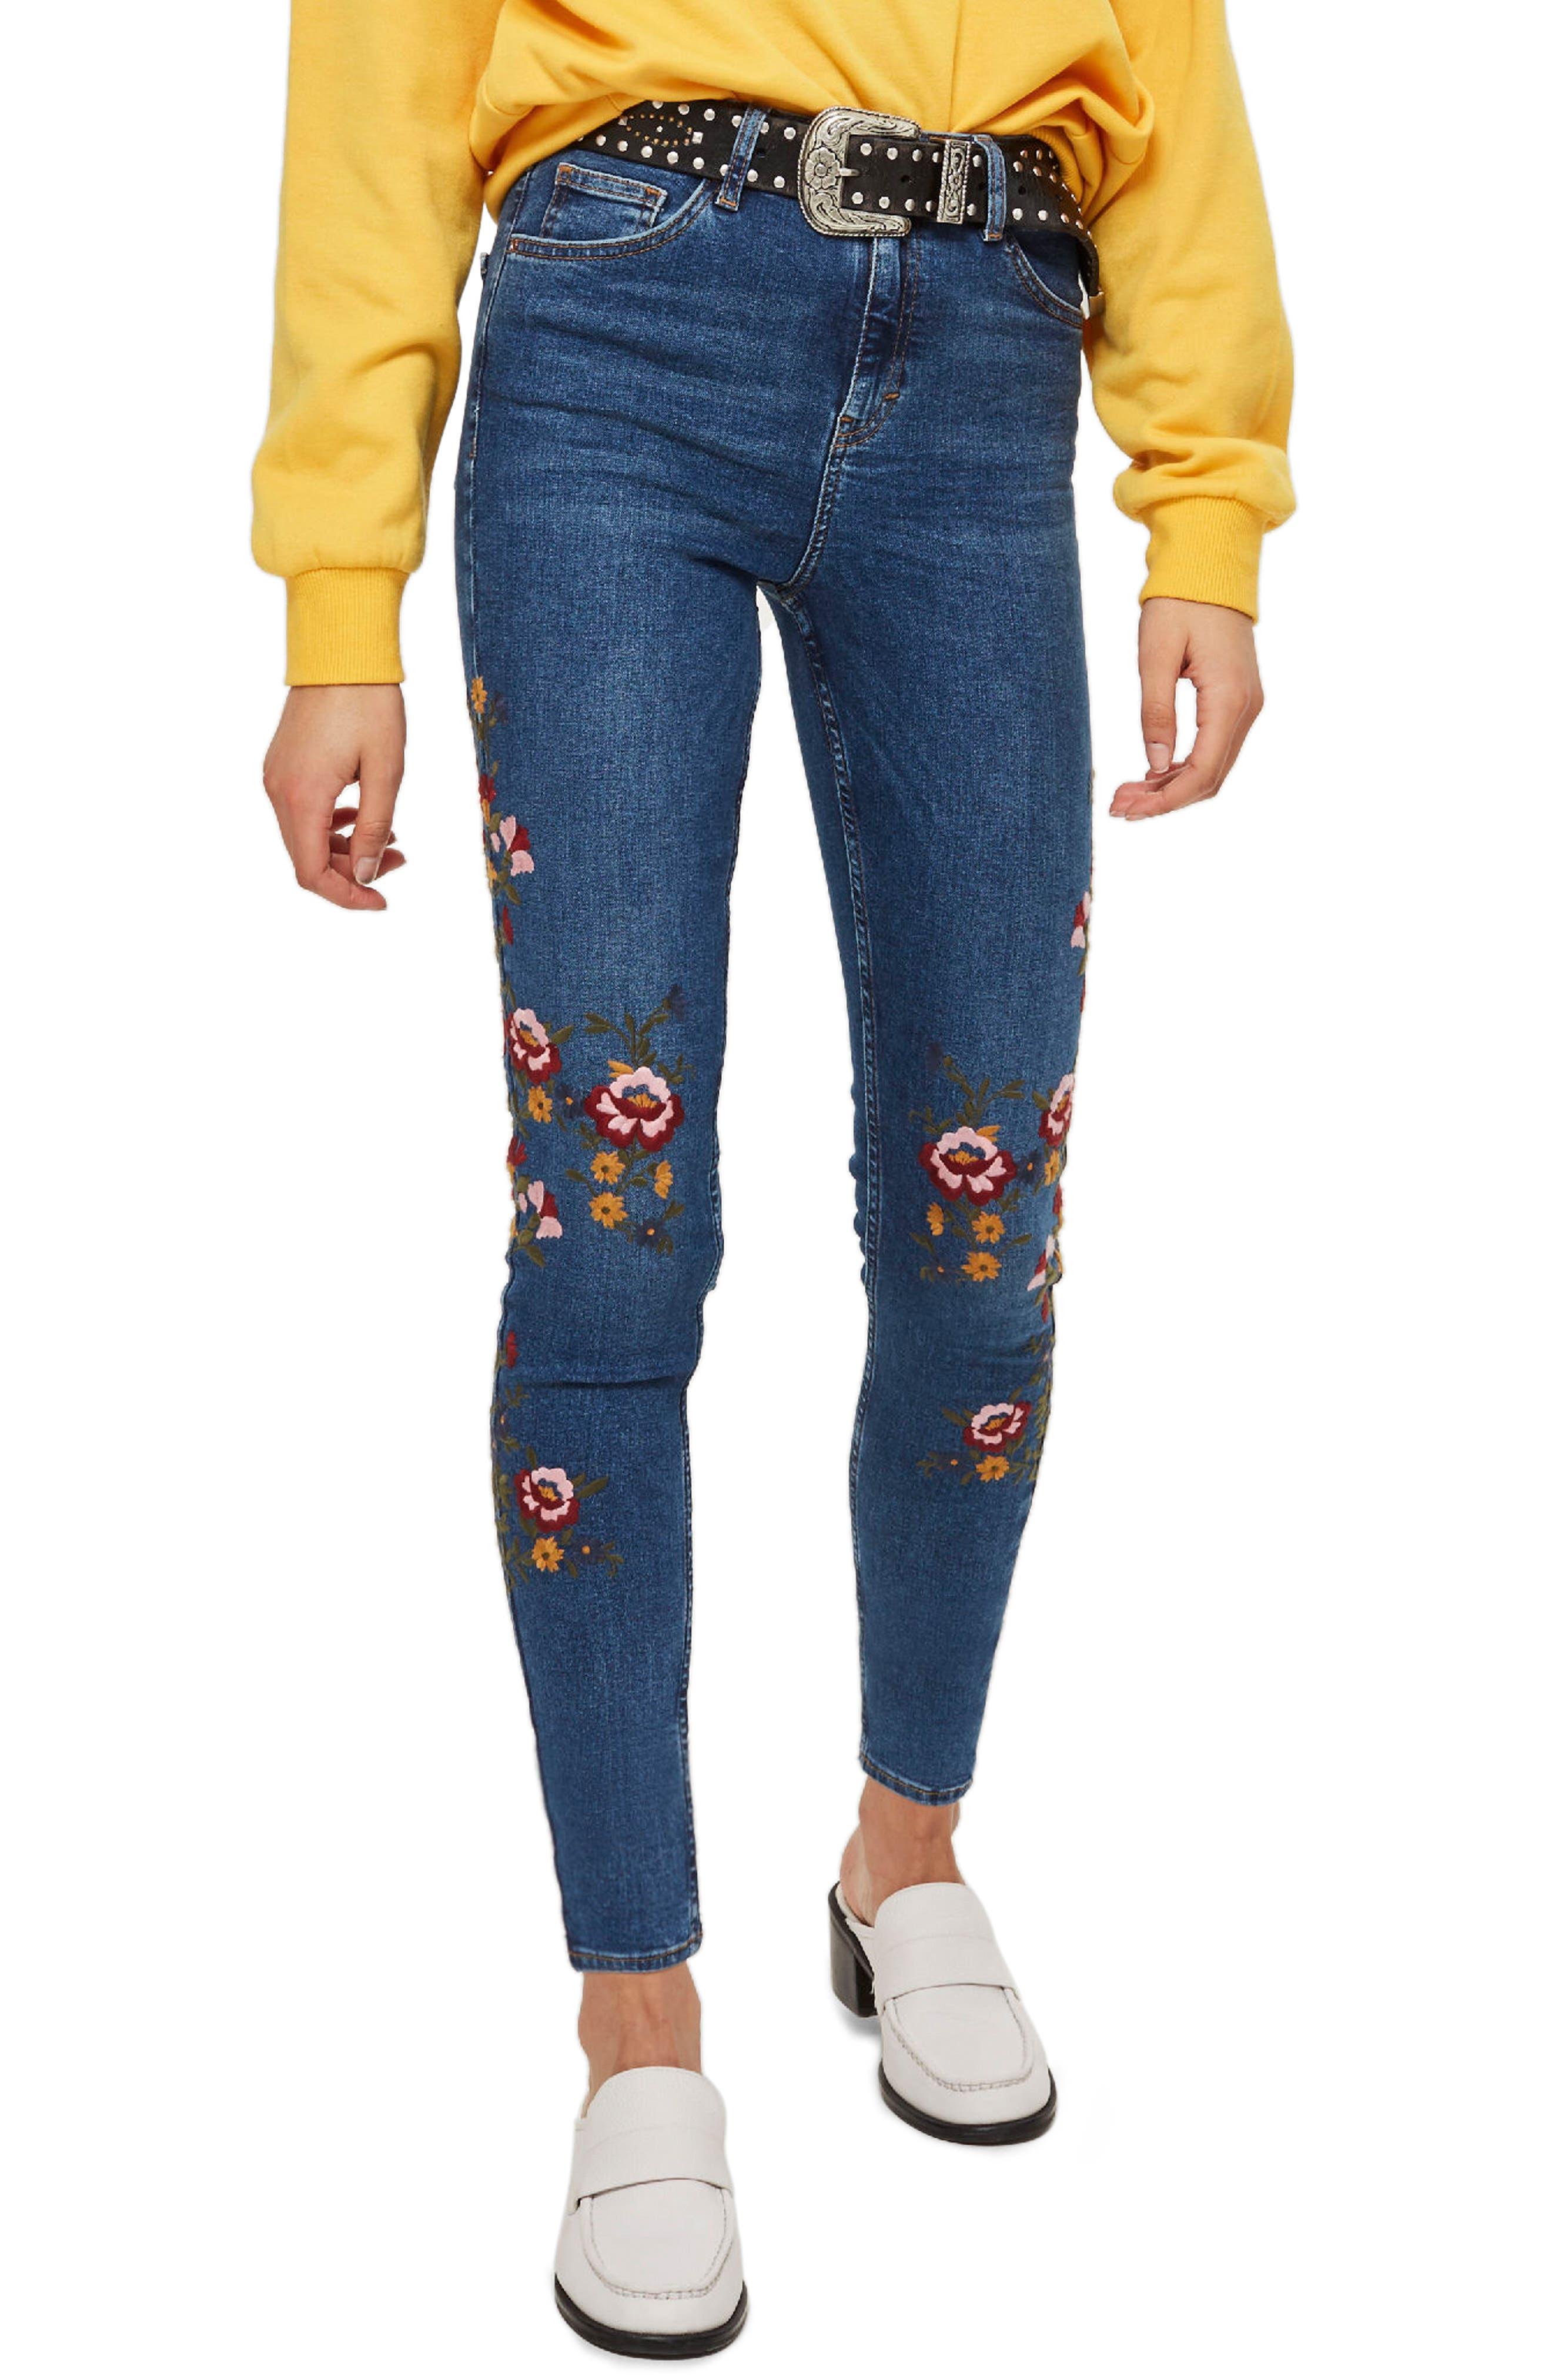 Jamie Ditsy Floral Jeans,                         Main,                         color, Mid Denim Multi